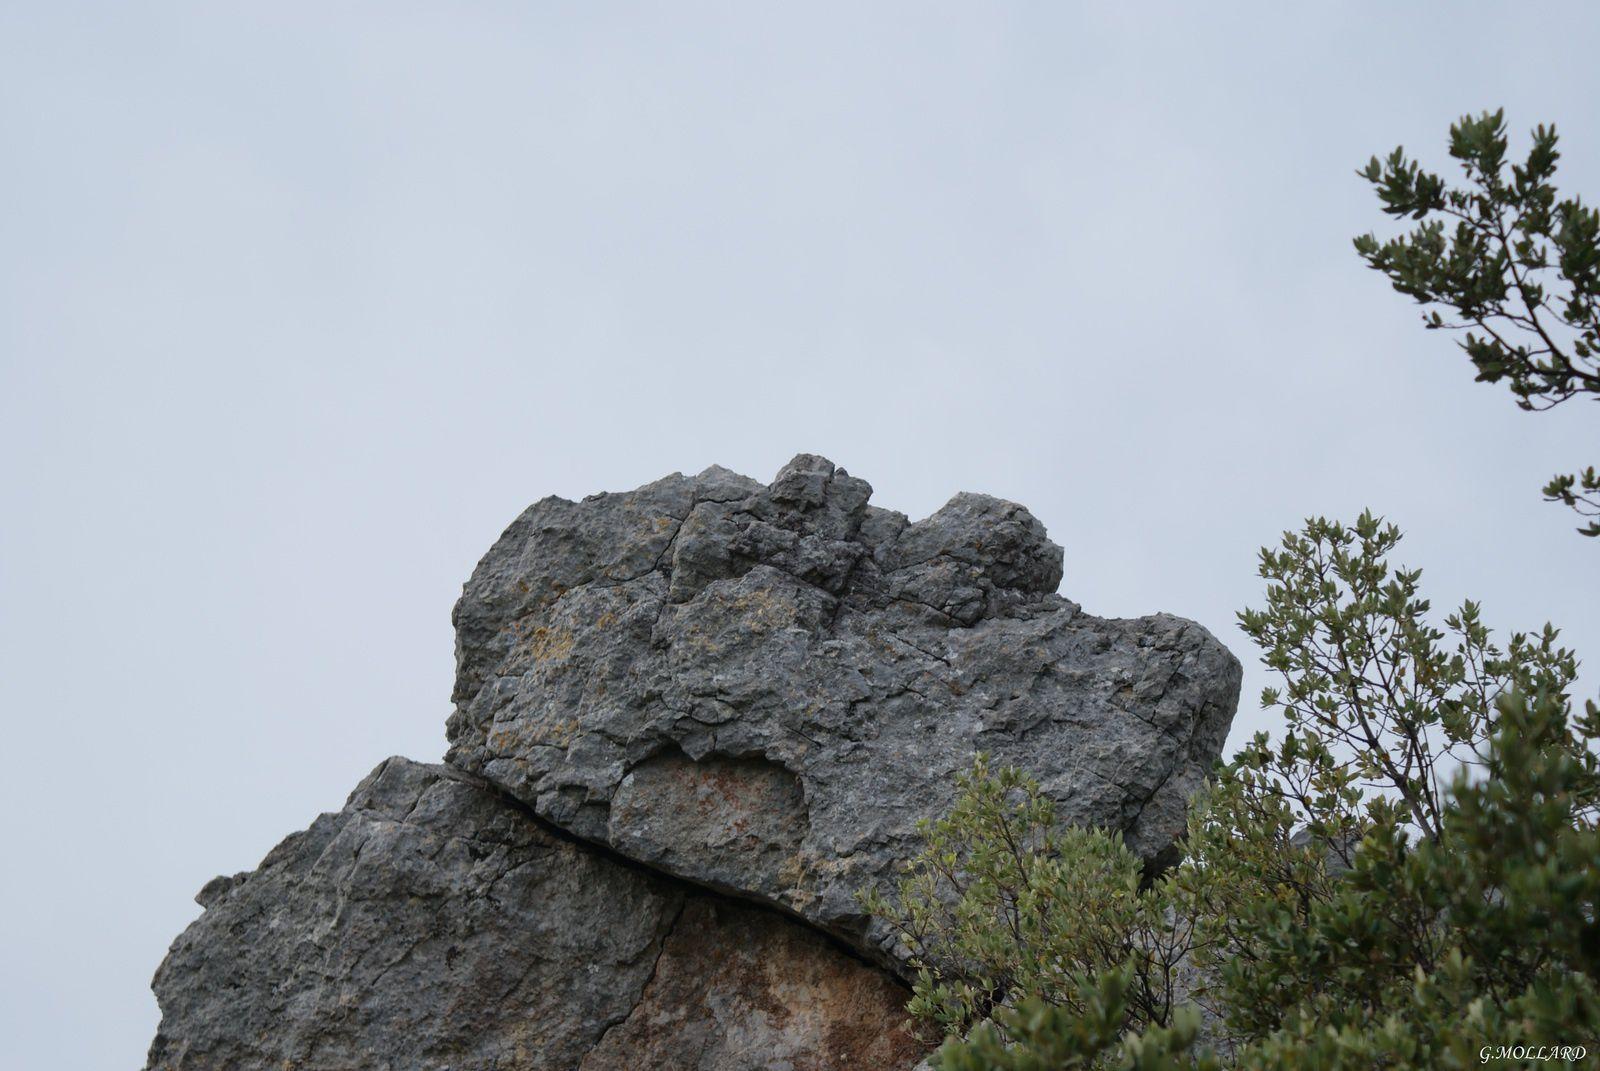 une tête de pierre